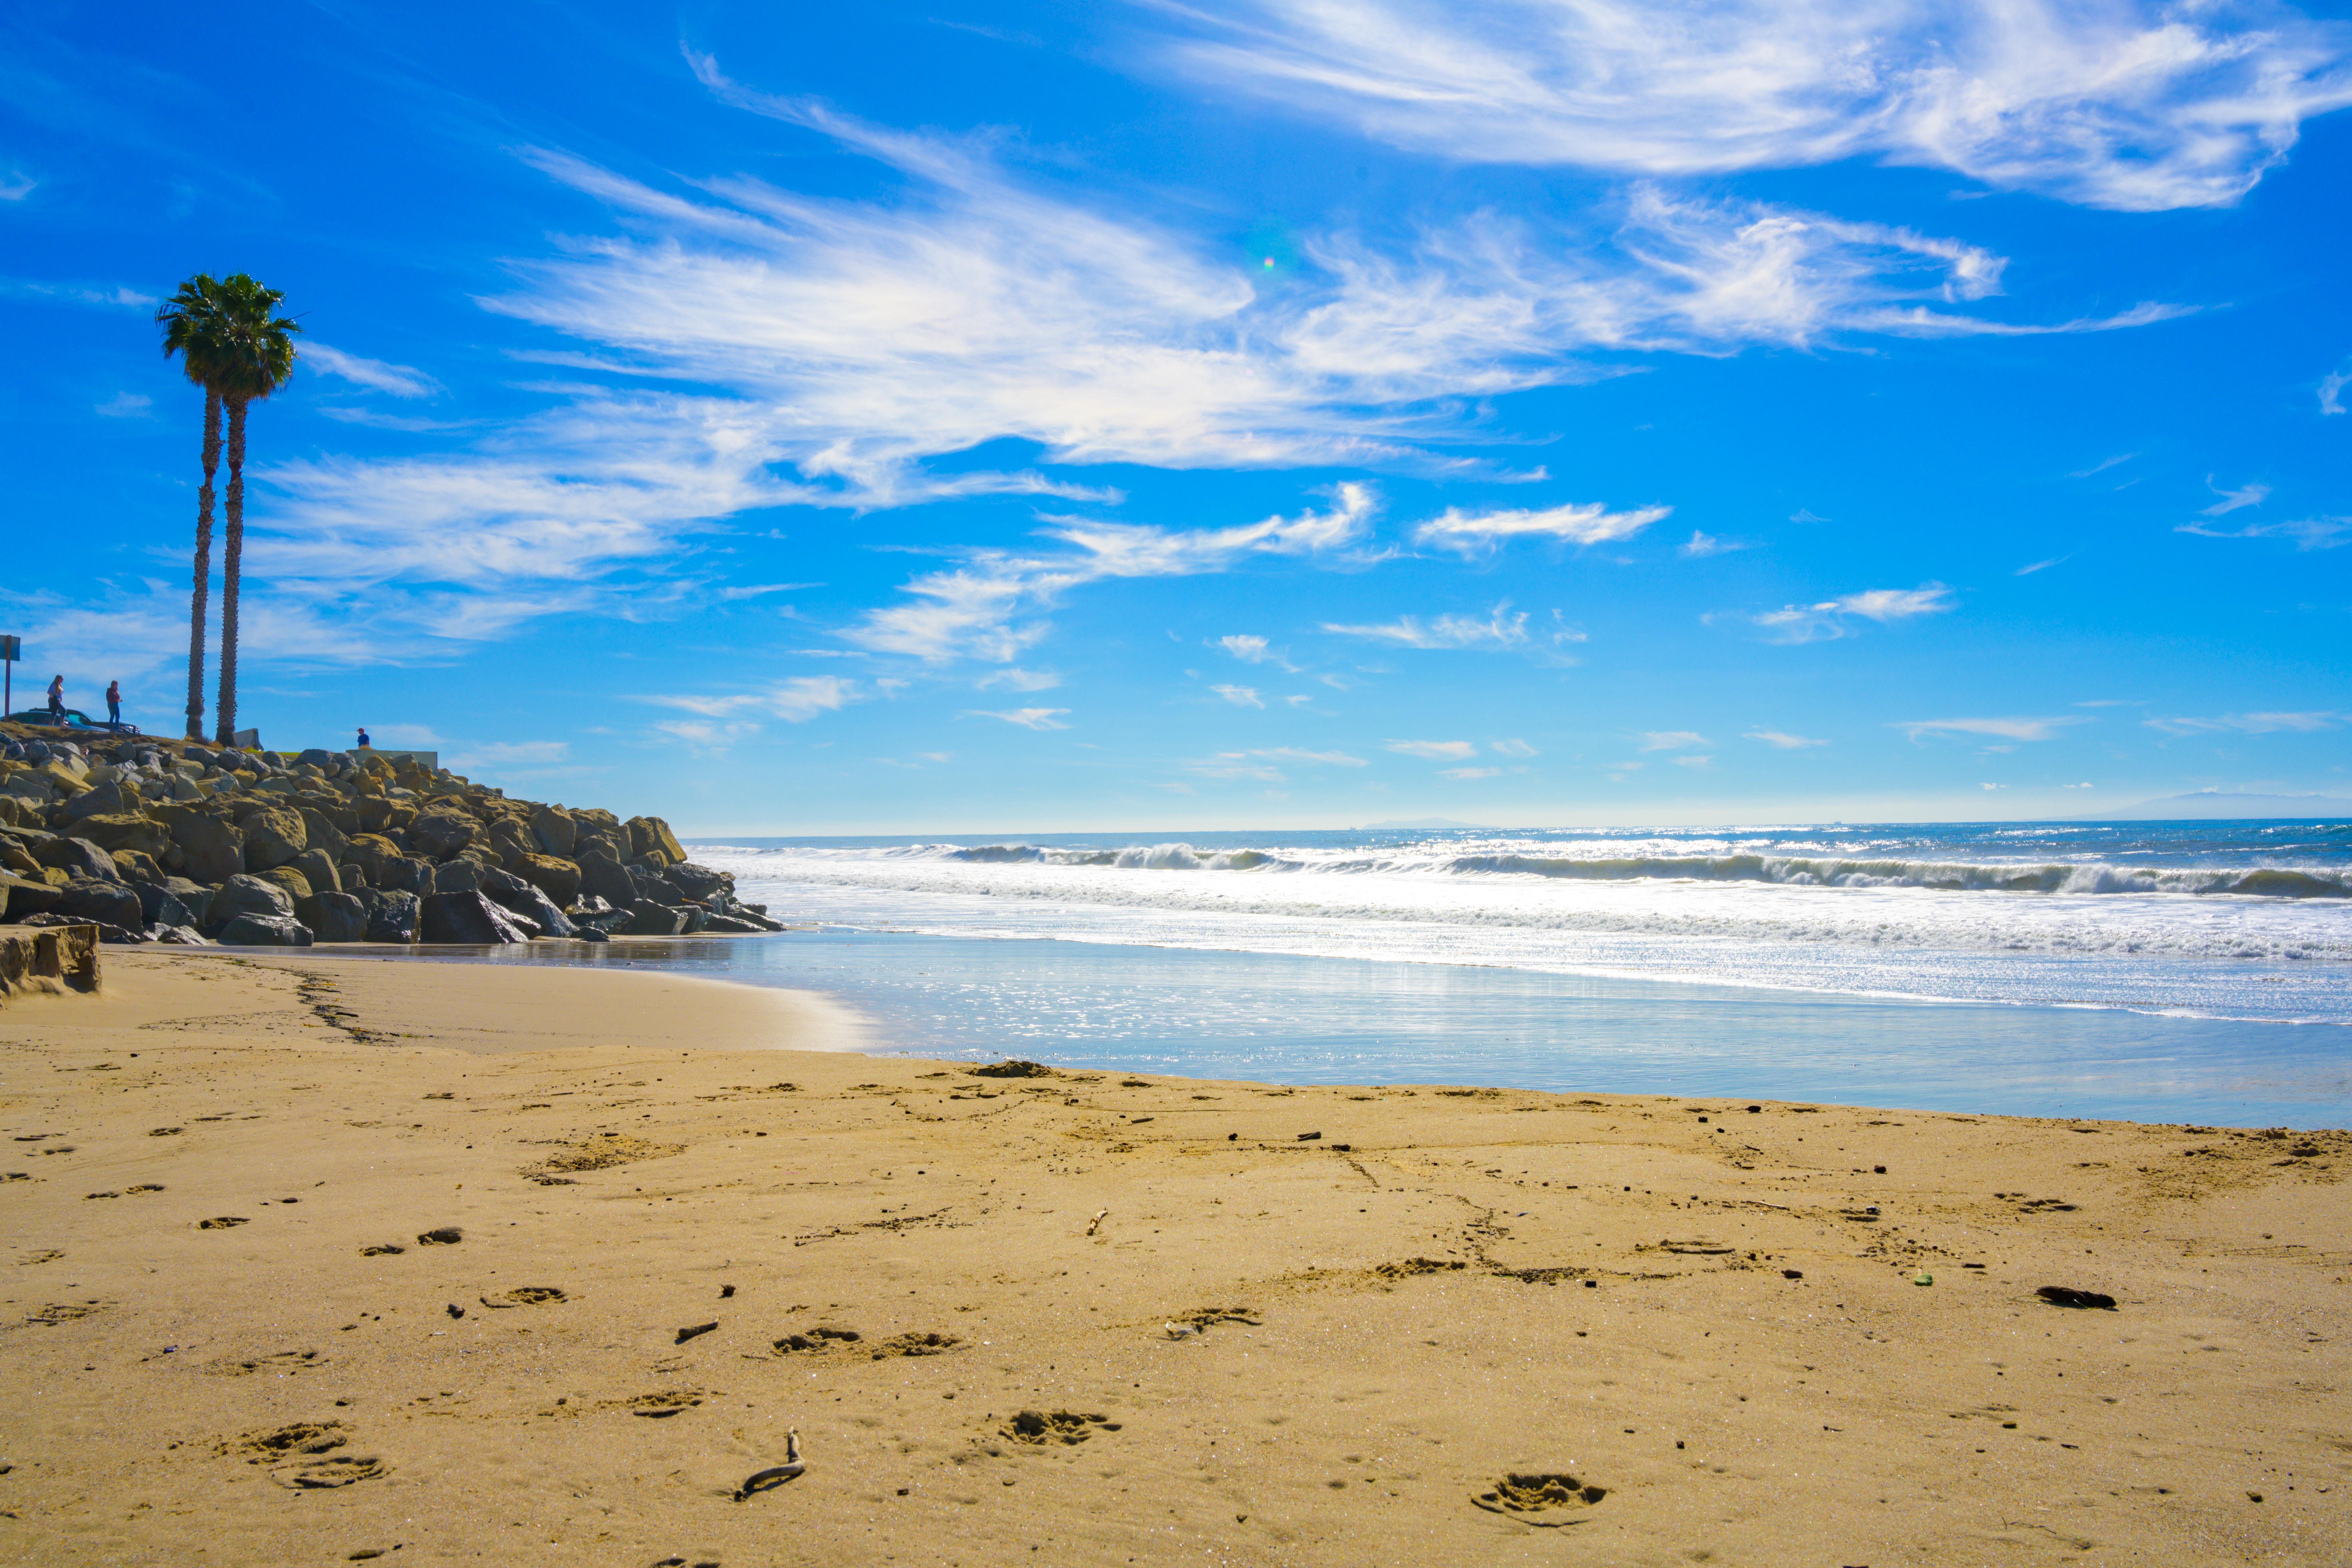 Ventura_Coast_Beach_Landscape